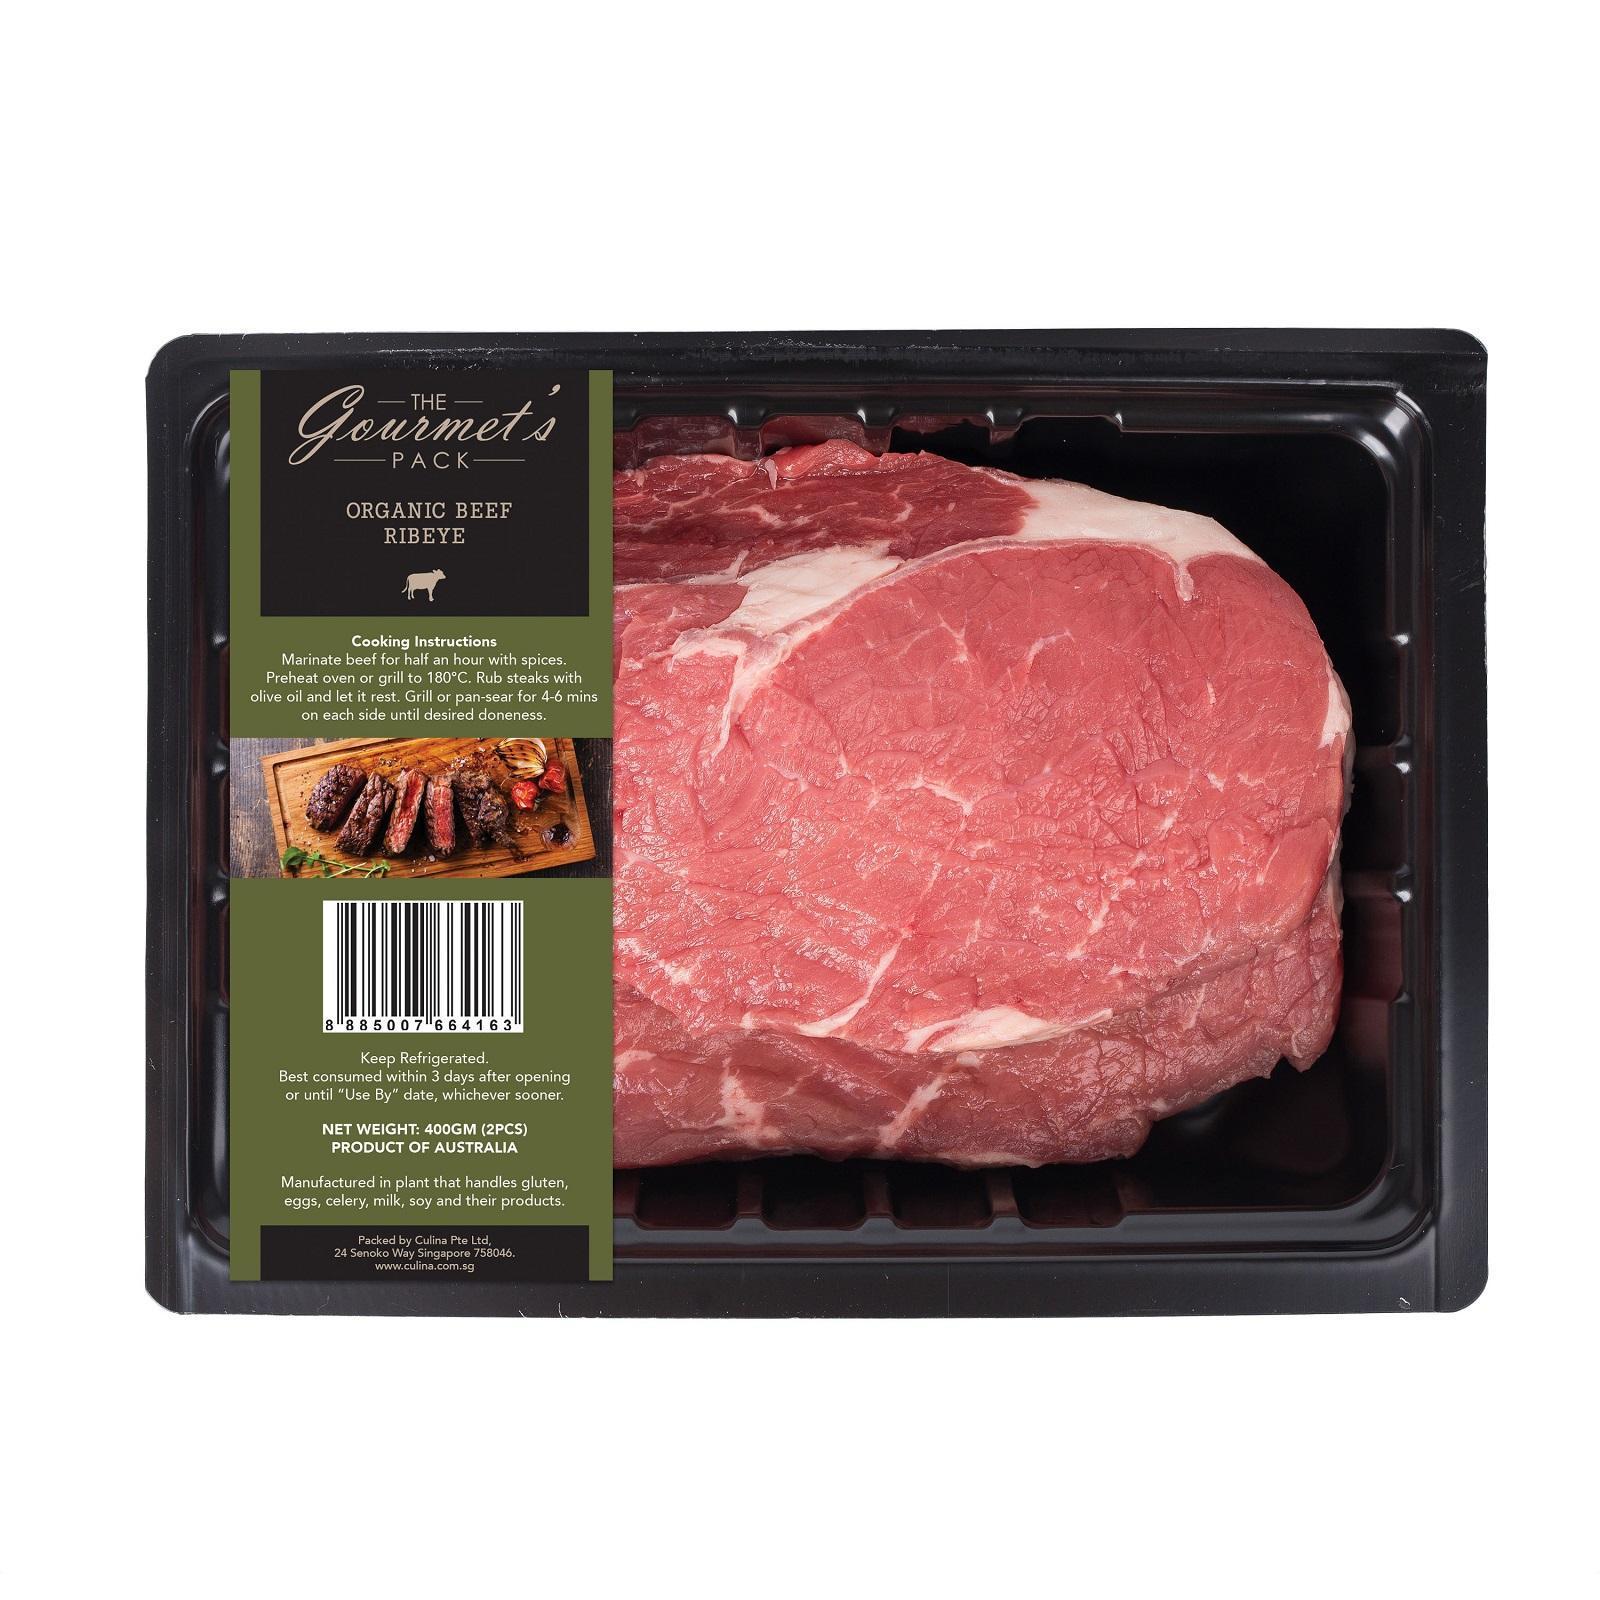 The Gourmet's Pack Organic Grass Fed Ribeye Beef - Australia